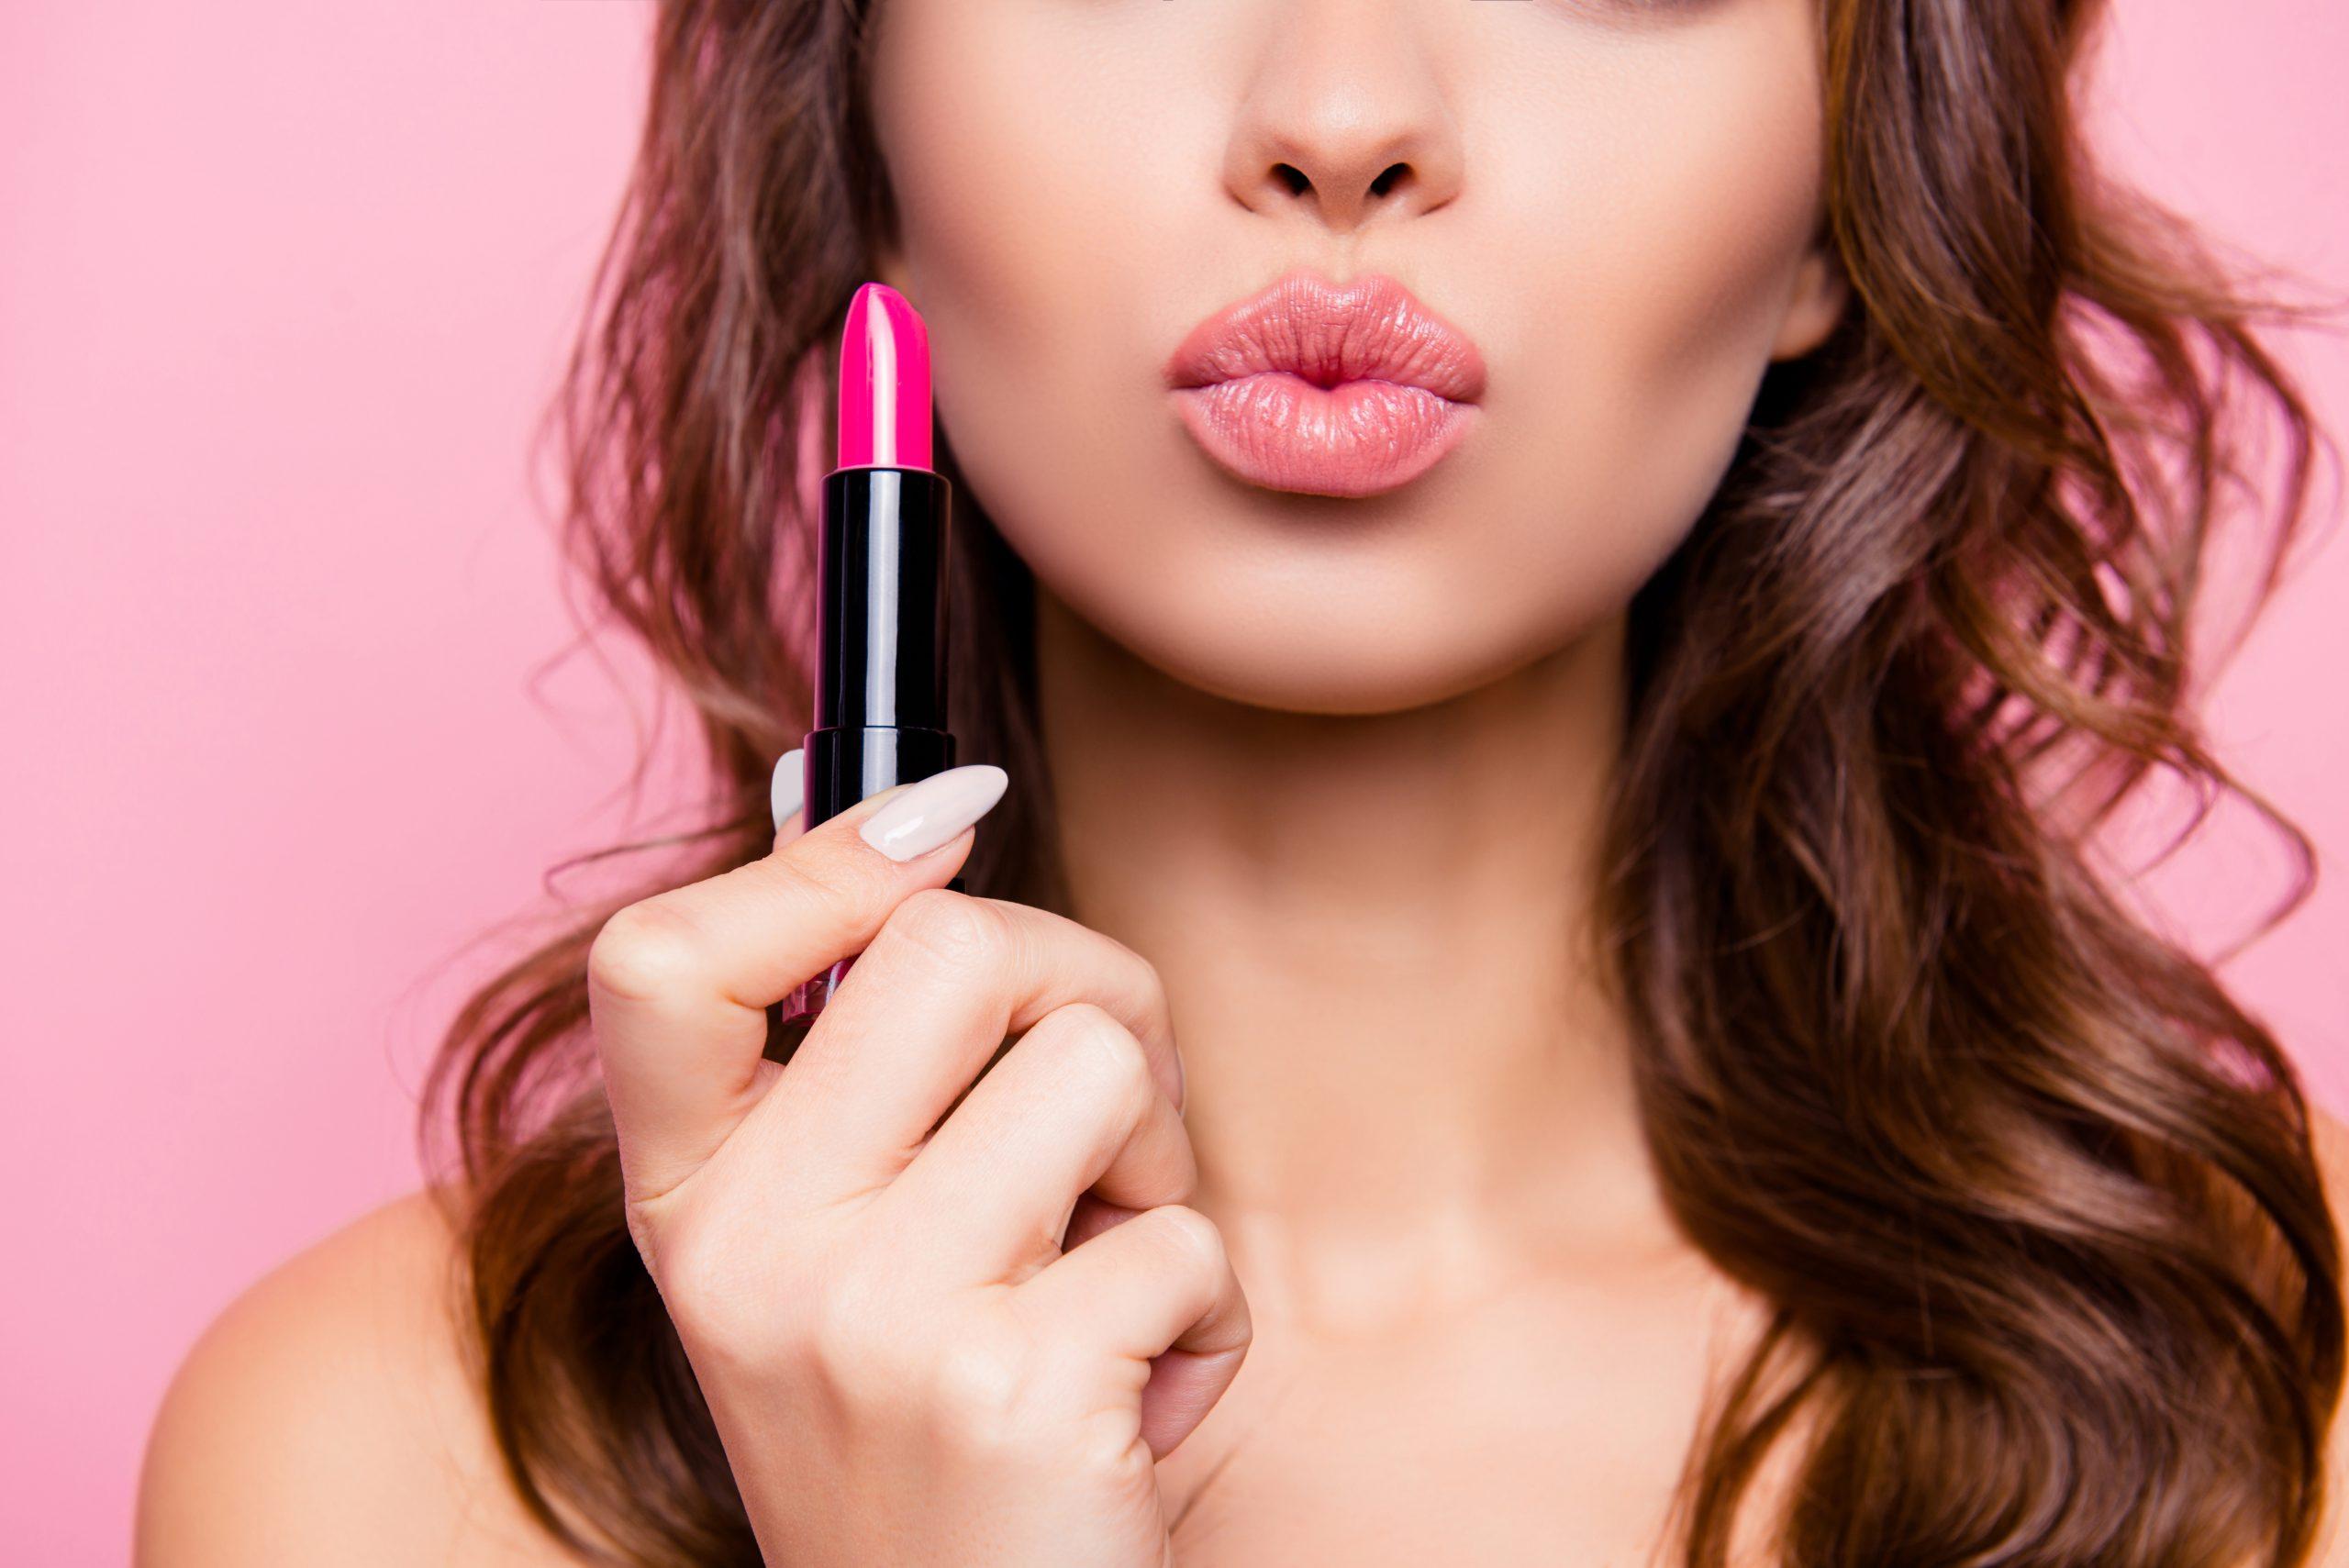 Anti Wrinkle Treatments, Lip Fillers, Lip filler near me, Botox near me, aesthetics worthing, botox price botox prices, dermal fillers worthing, dermal fillers near me